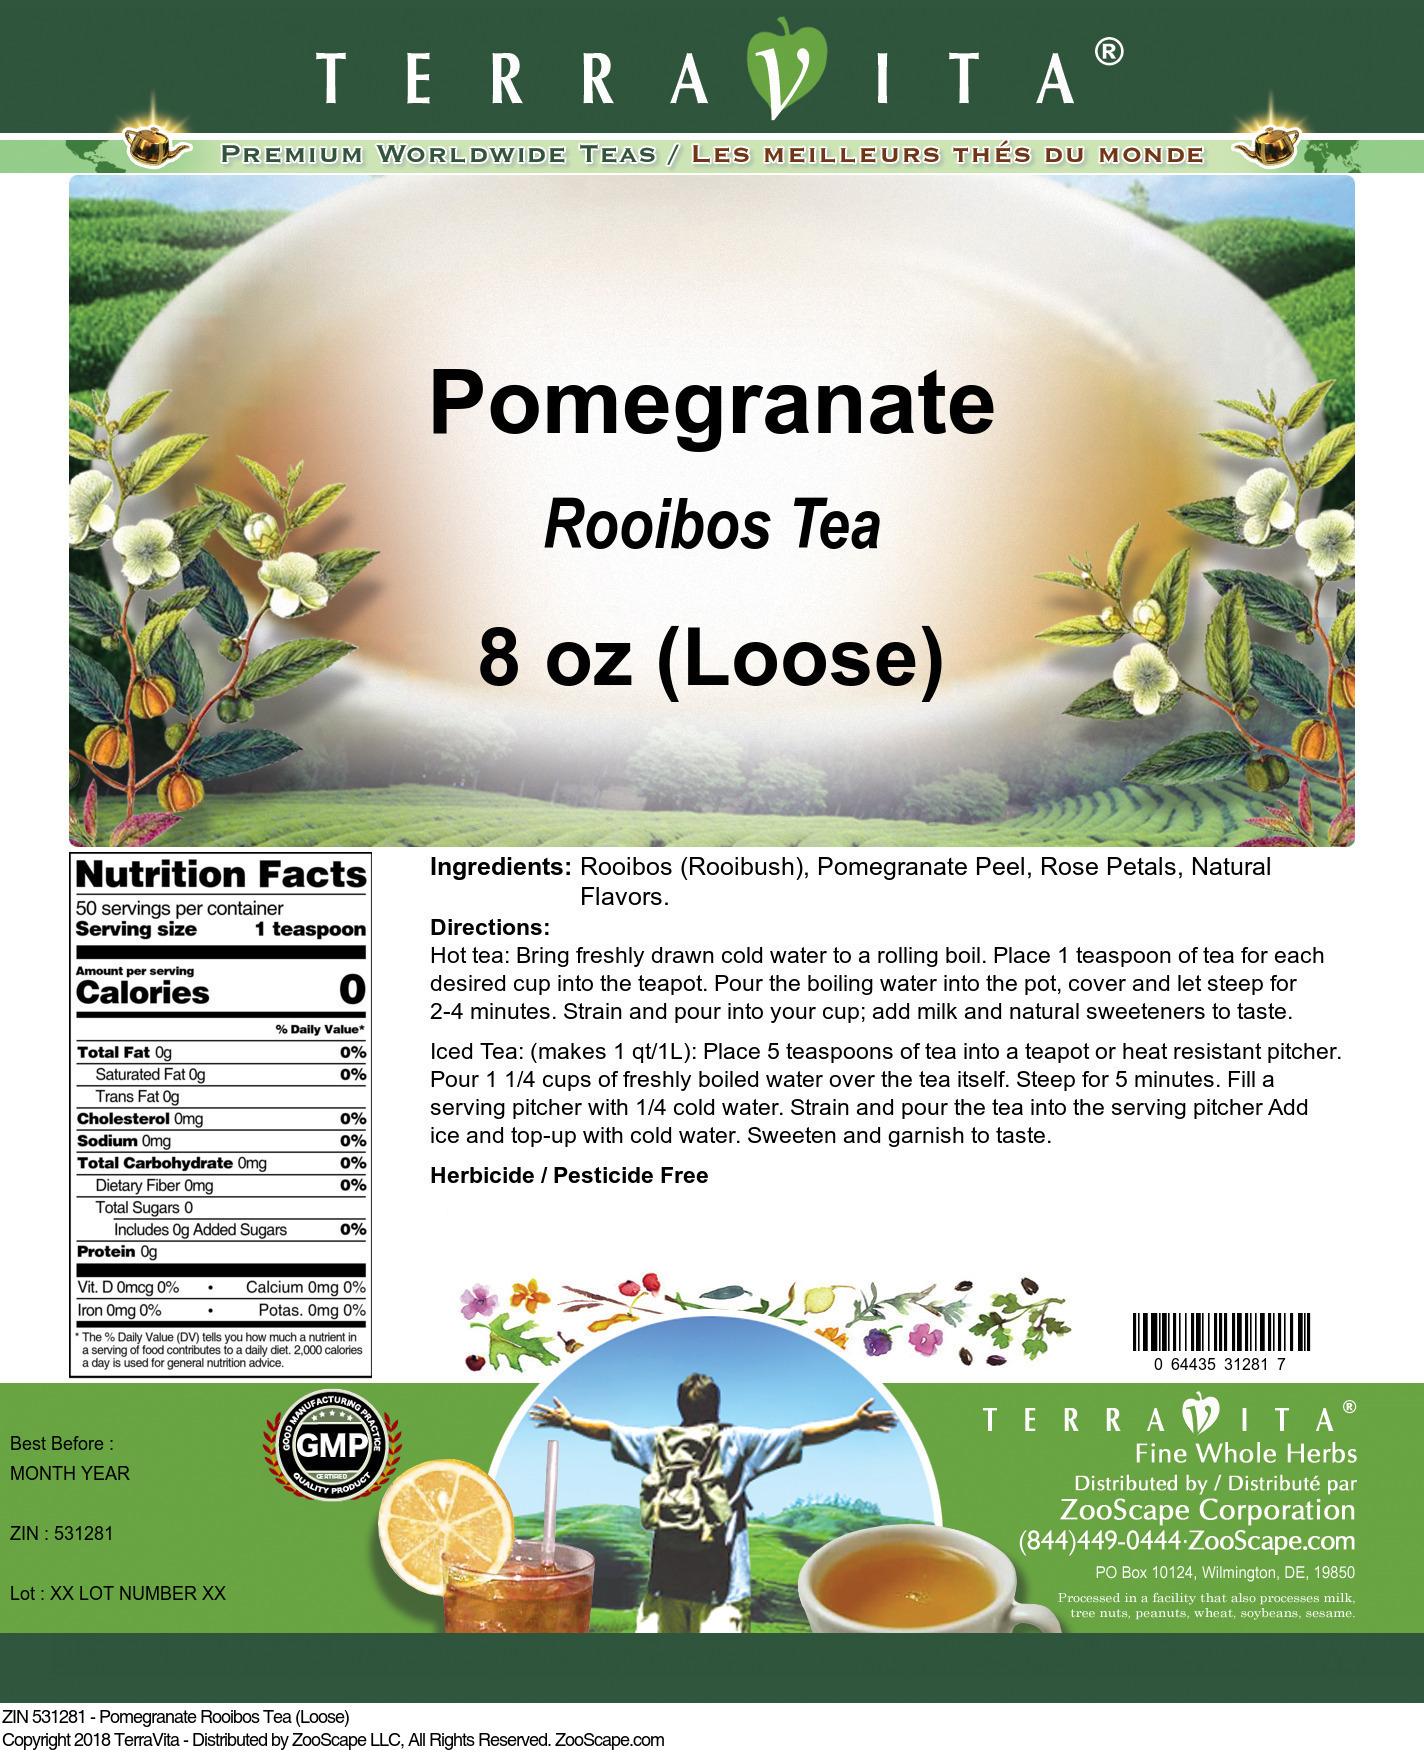 Pomegranate Rooibos Tea (Loose)